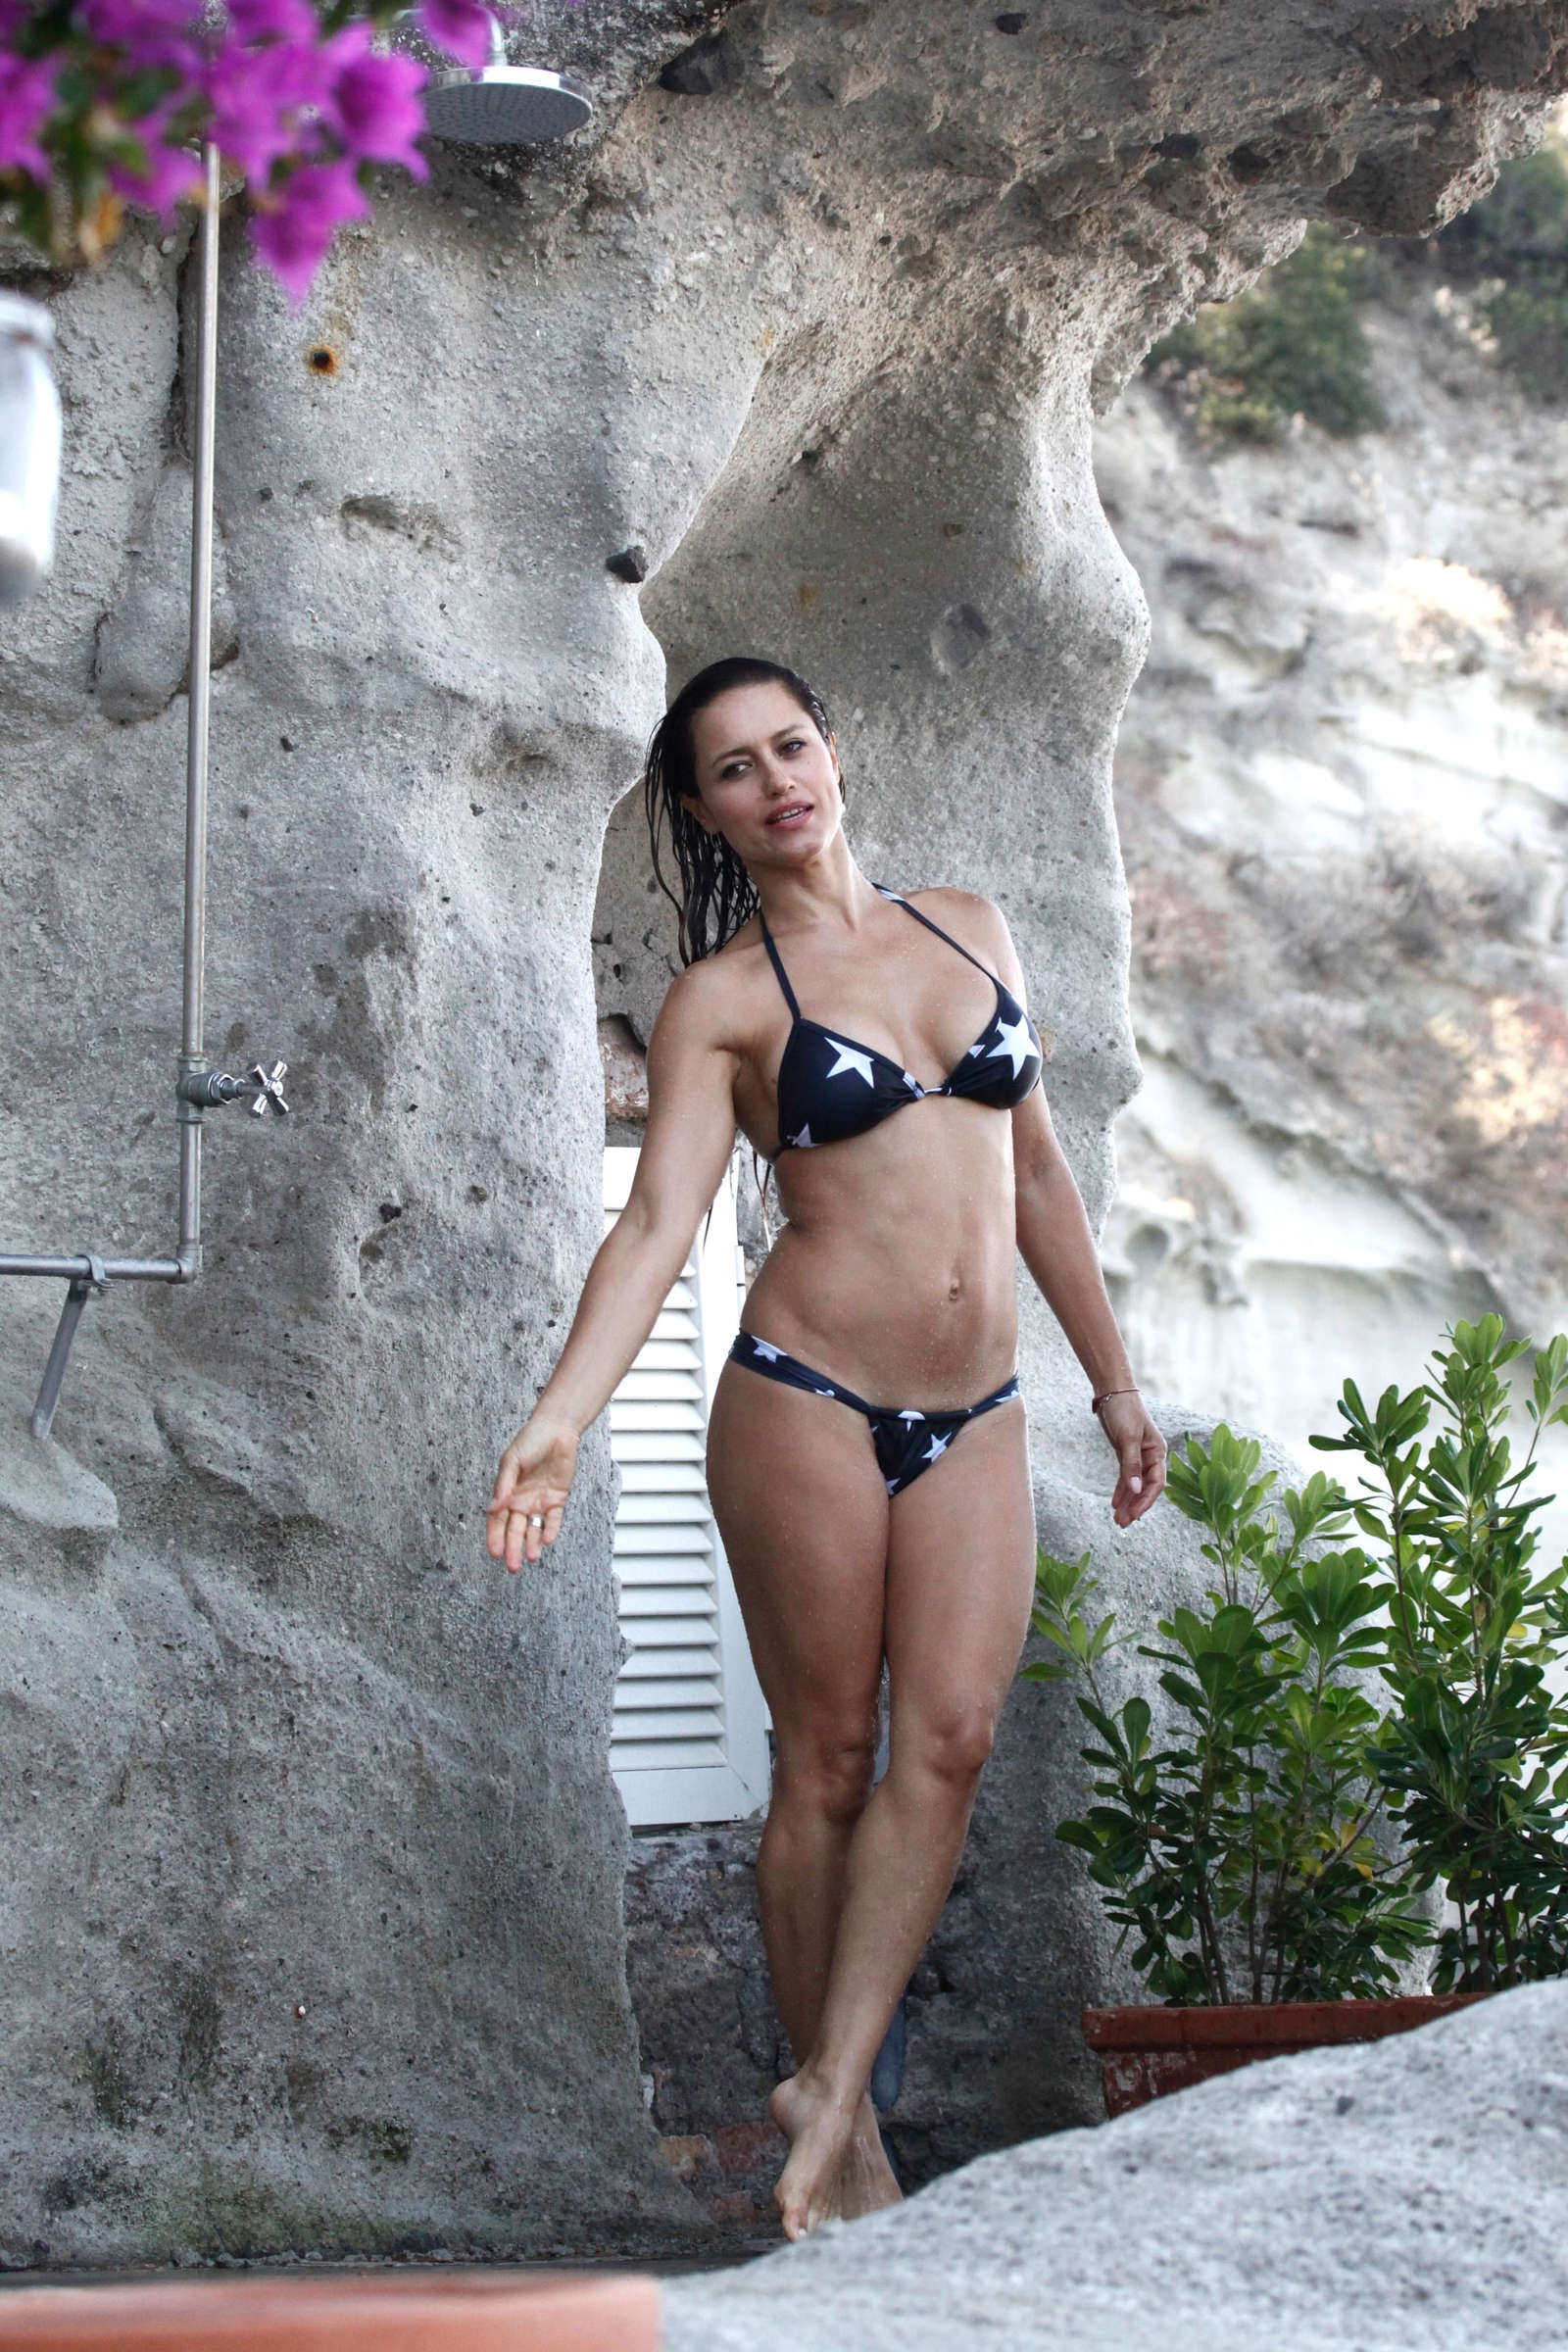 Ana de armas nude sex scene in mentiras y scandalplanetcom - 2 part 1